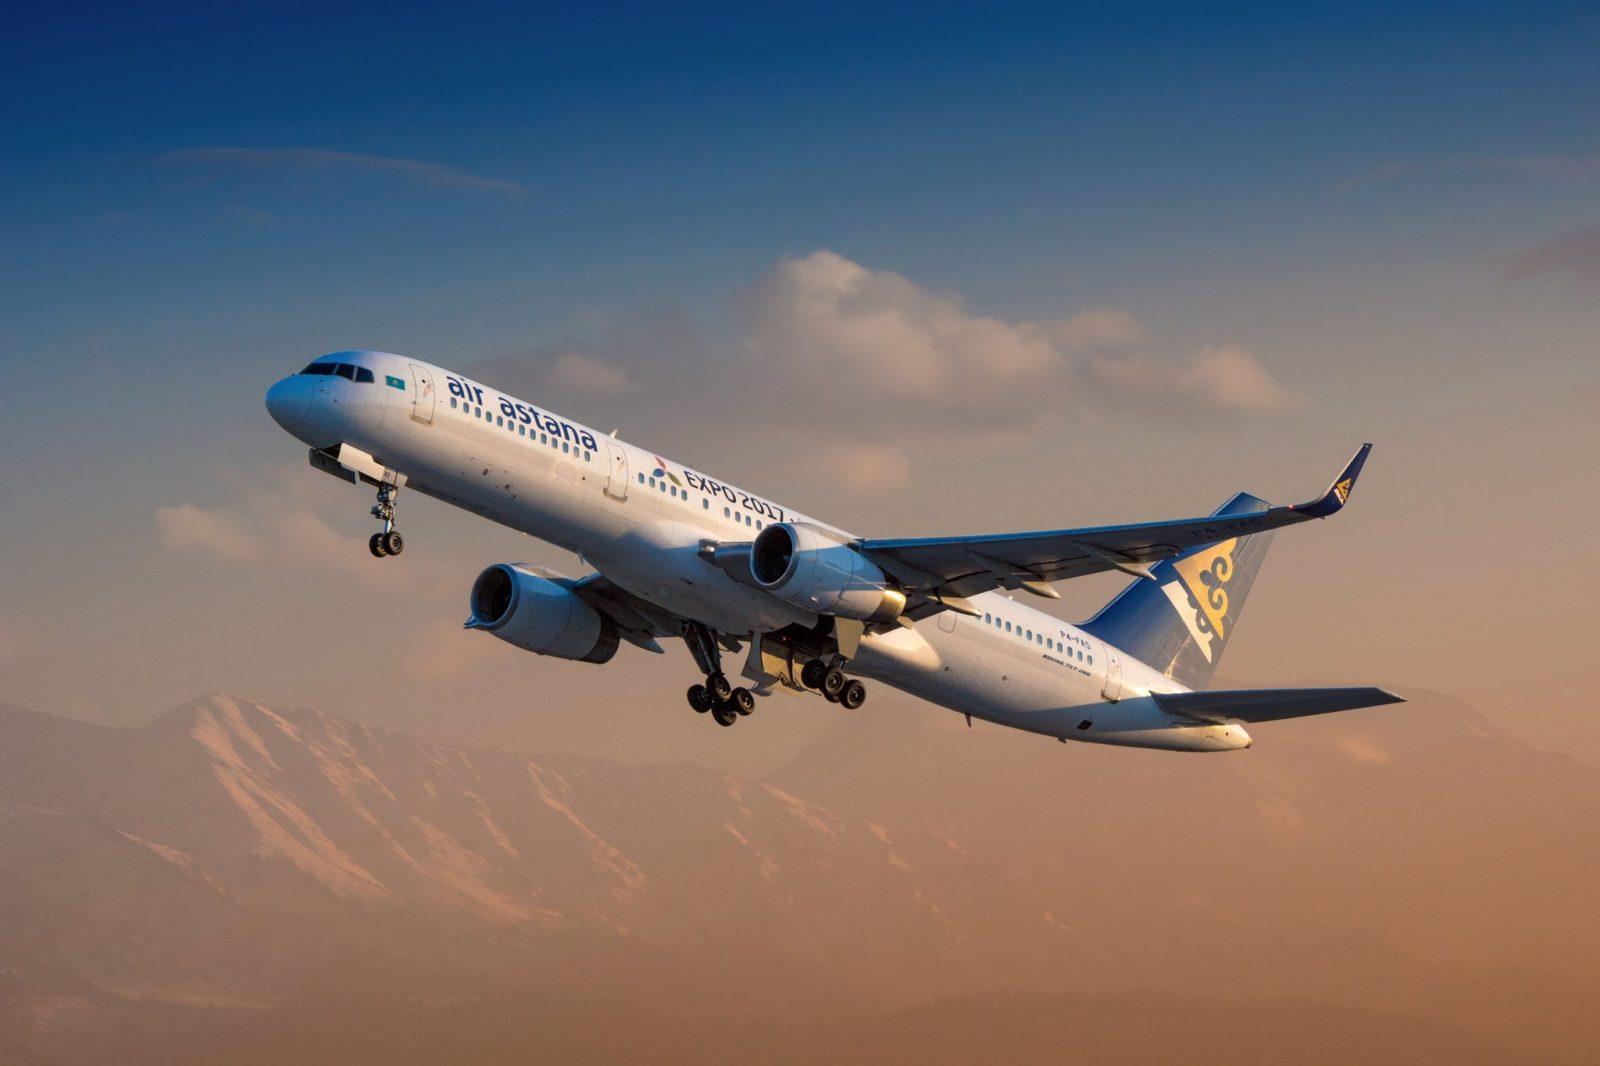 air astana - ავიაკომპანია ეარ ასტანა - Air Astana